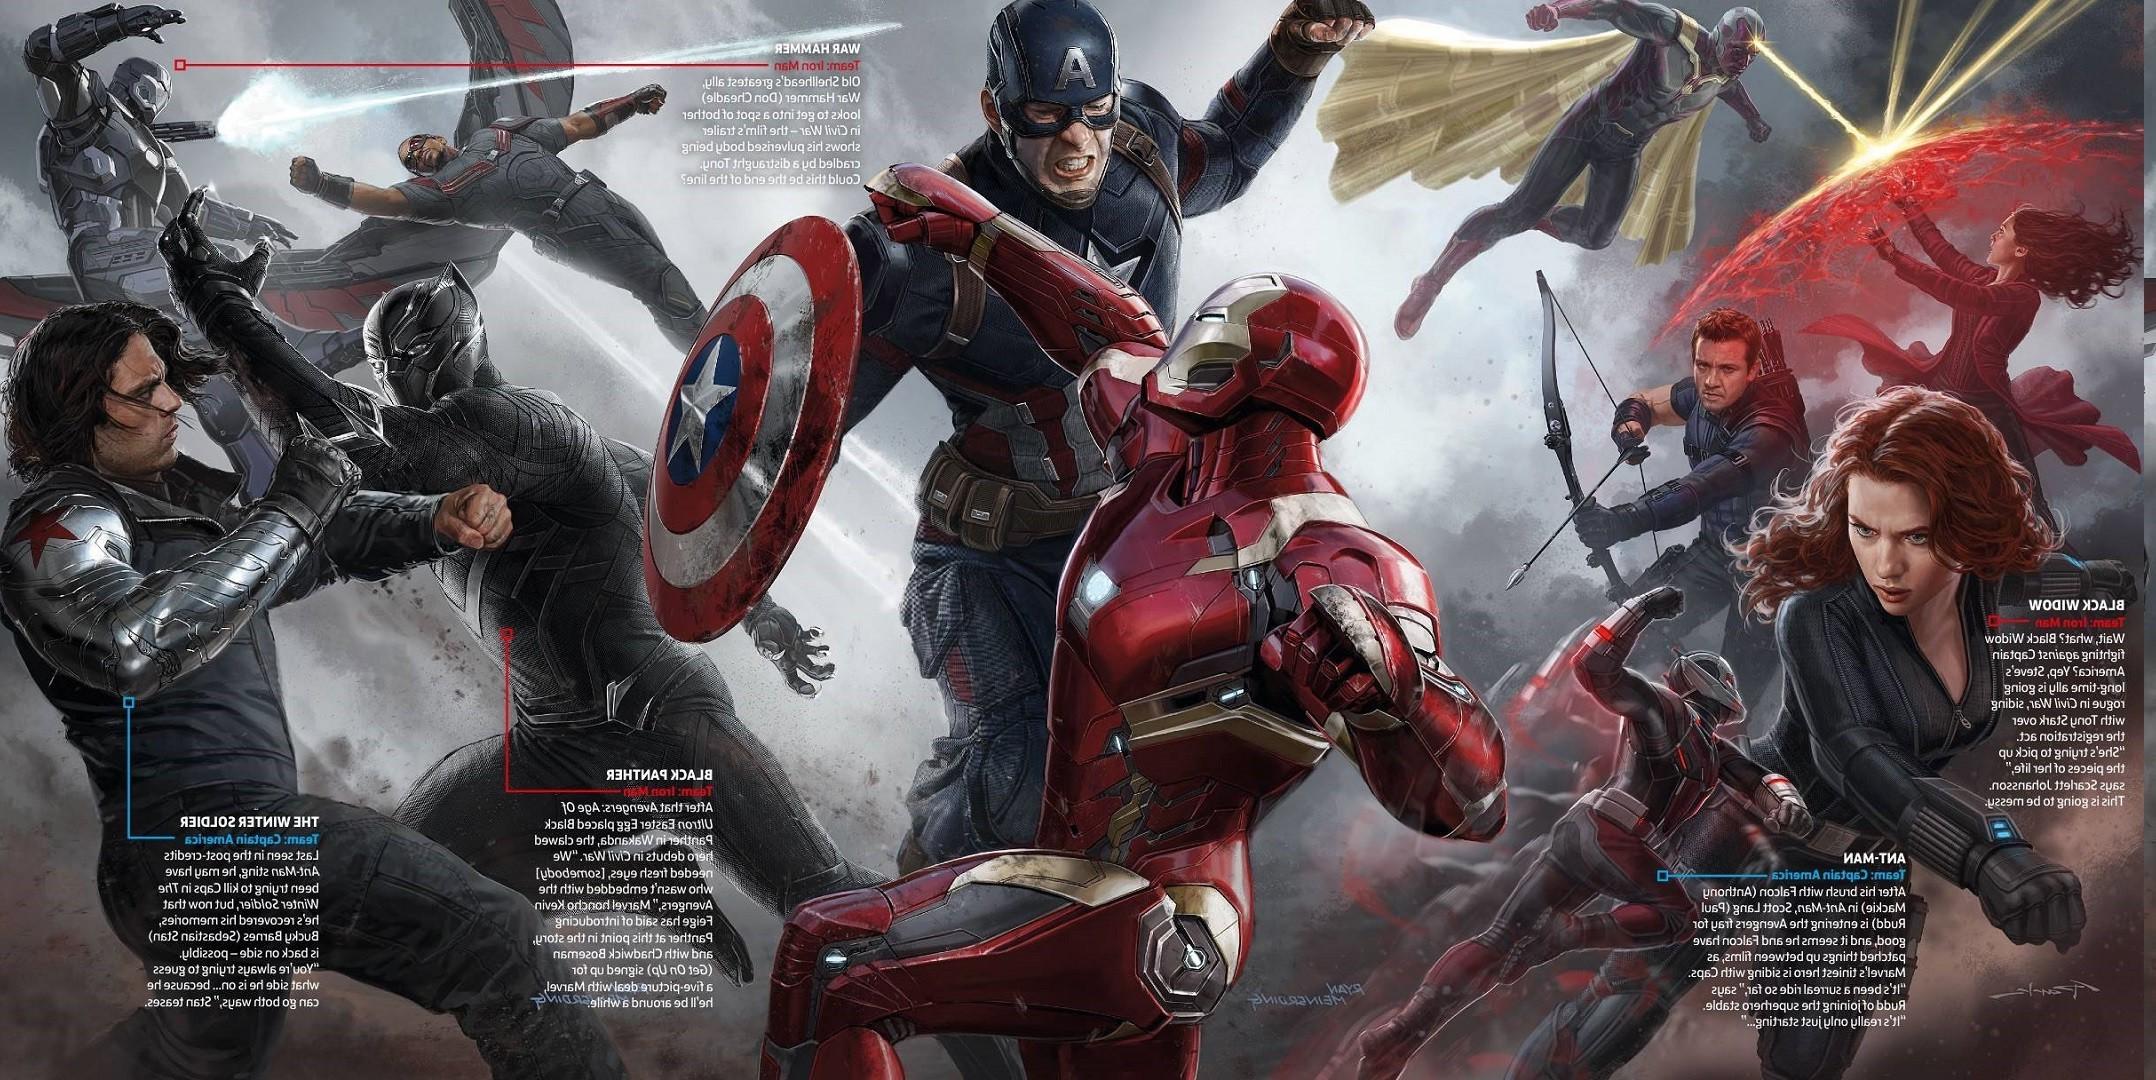 Simple Scott Lang Infinity War Wallpaper - 975350-ant-man-wallpapers-2156x1080-for-ios  Photograph_943972 .jpg